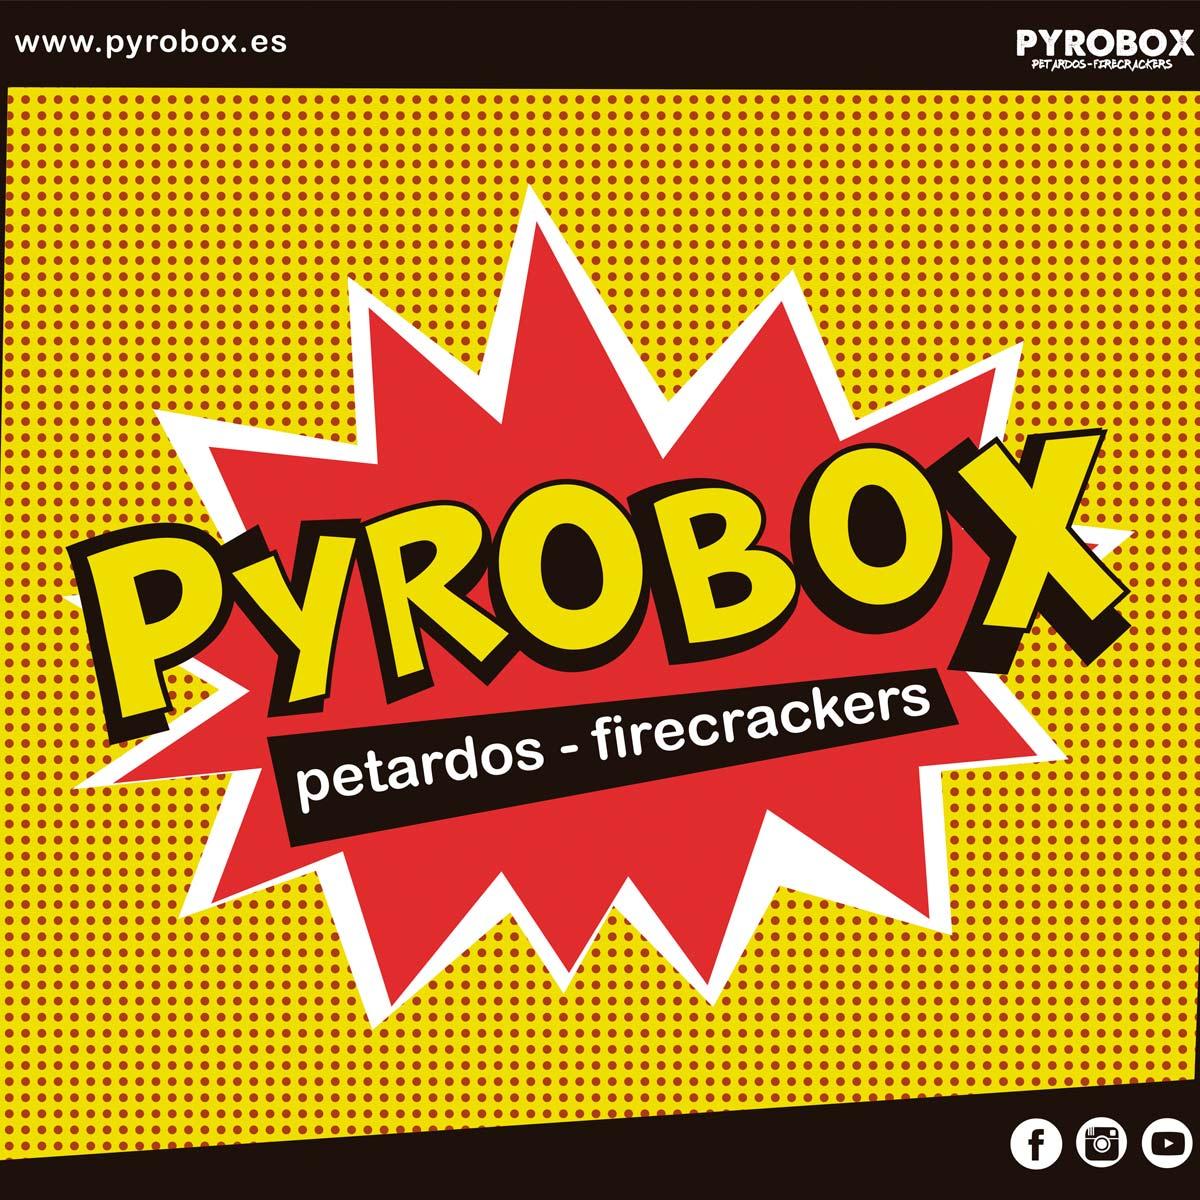 pyrobox